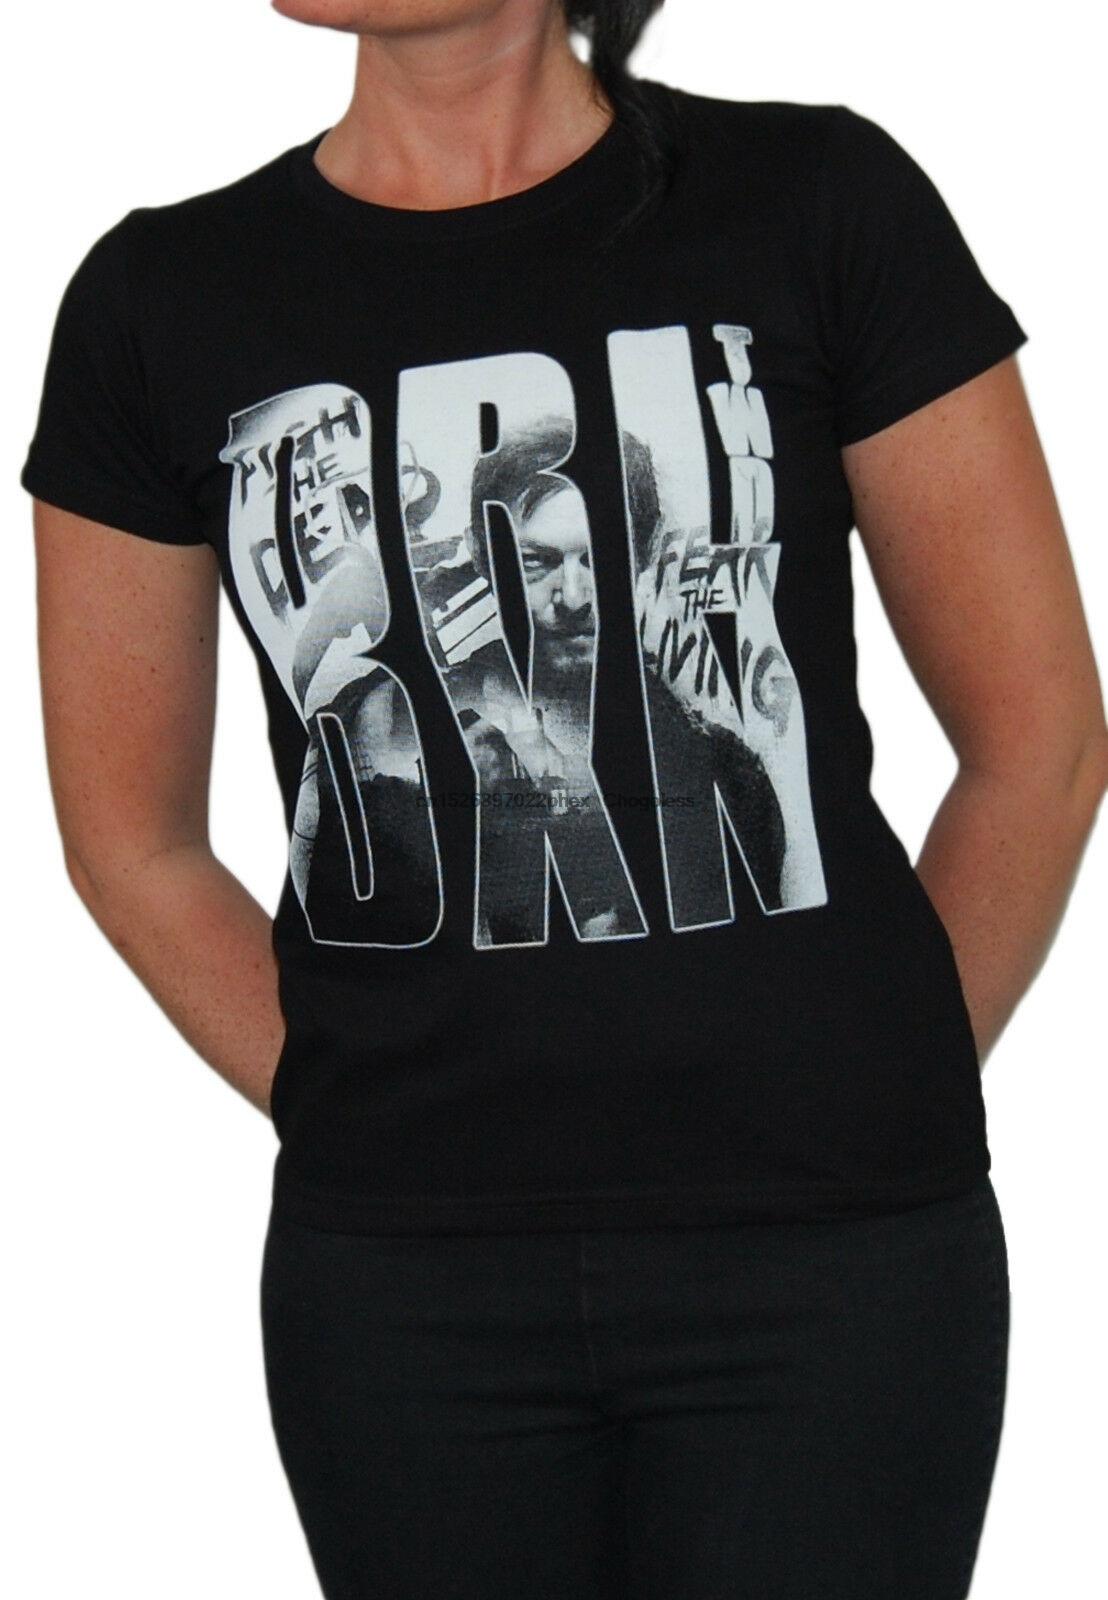 Daryl dixon girlie the walking dead horror zombie daryl dixon série rick crimes t camisa